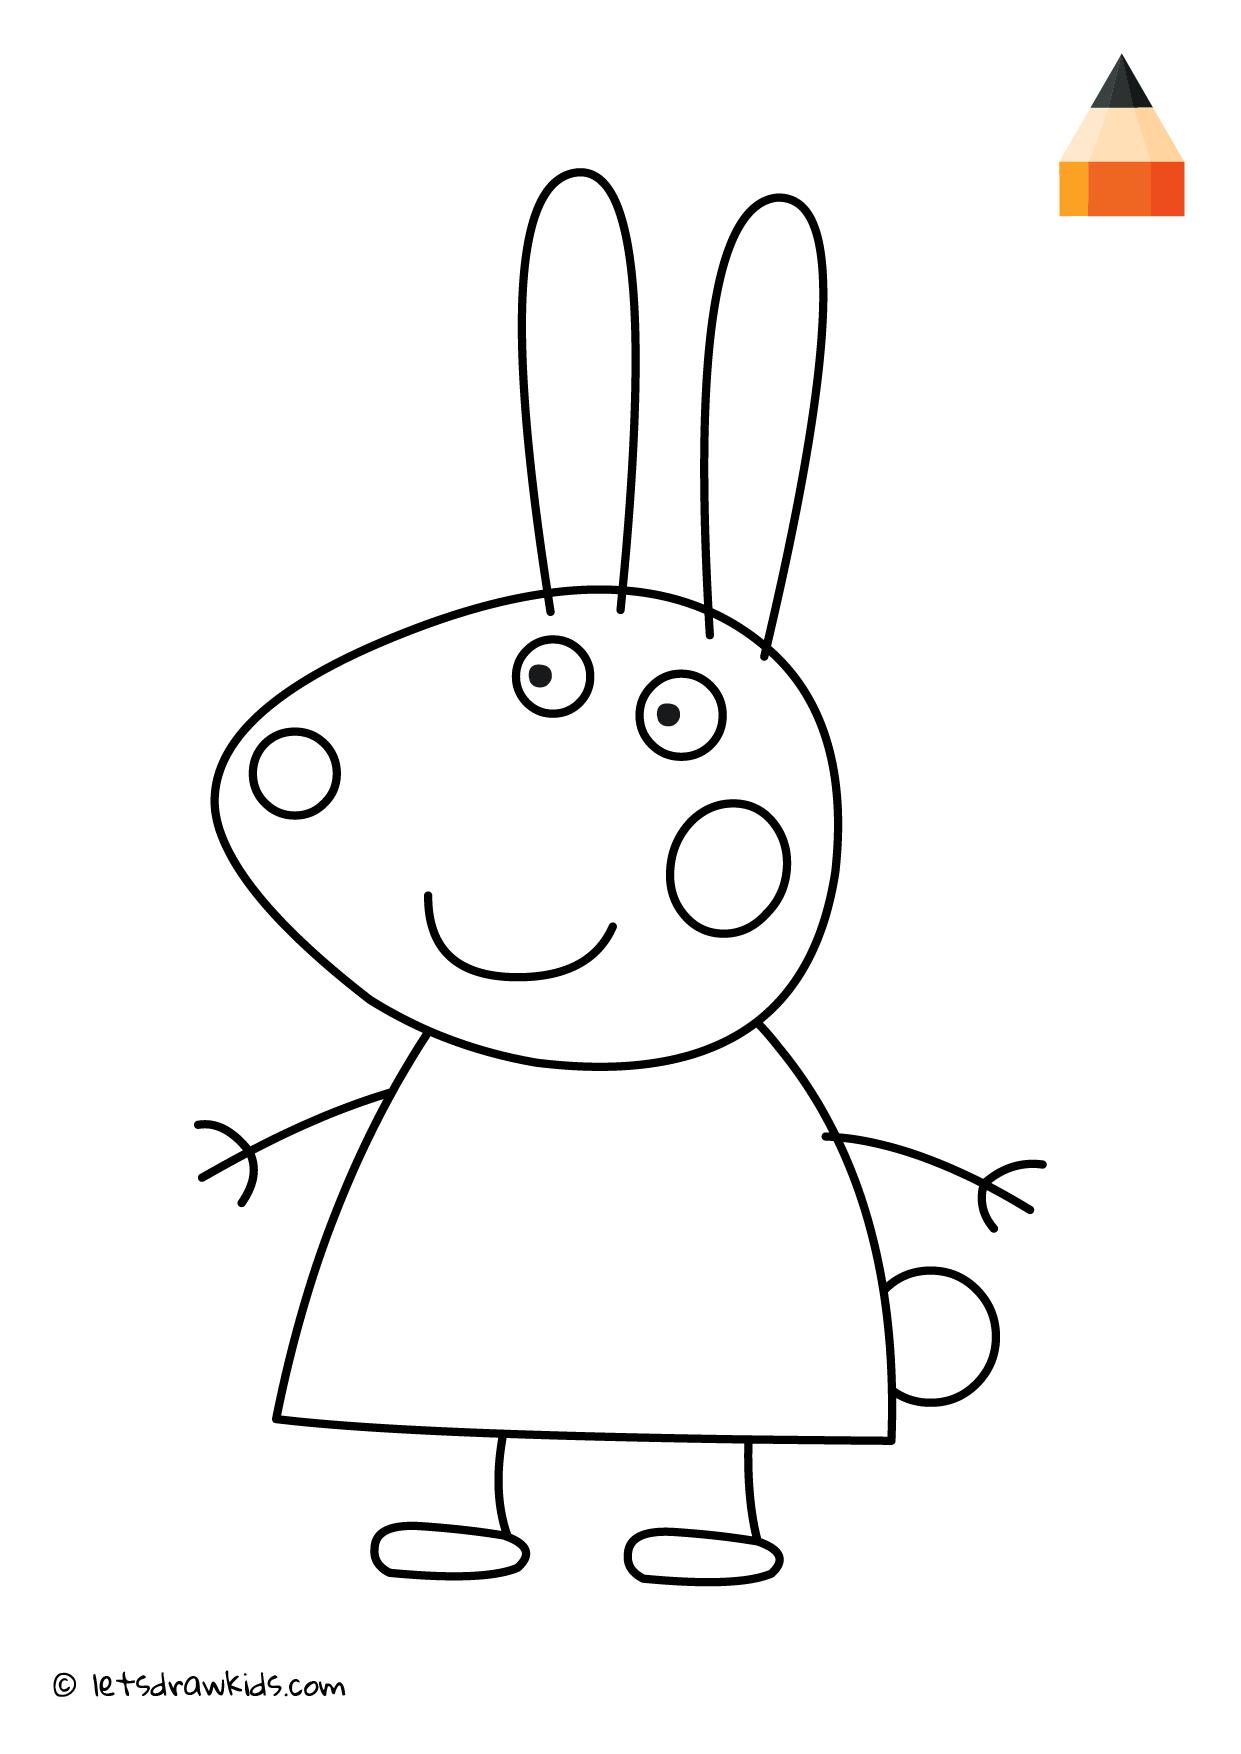 Coloring Page Peppa Pig Rebecca Rabbit Peppa Pig Coloring Pages Rebecca Rabbit Peppa Pig Colouring